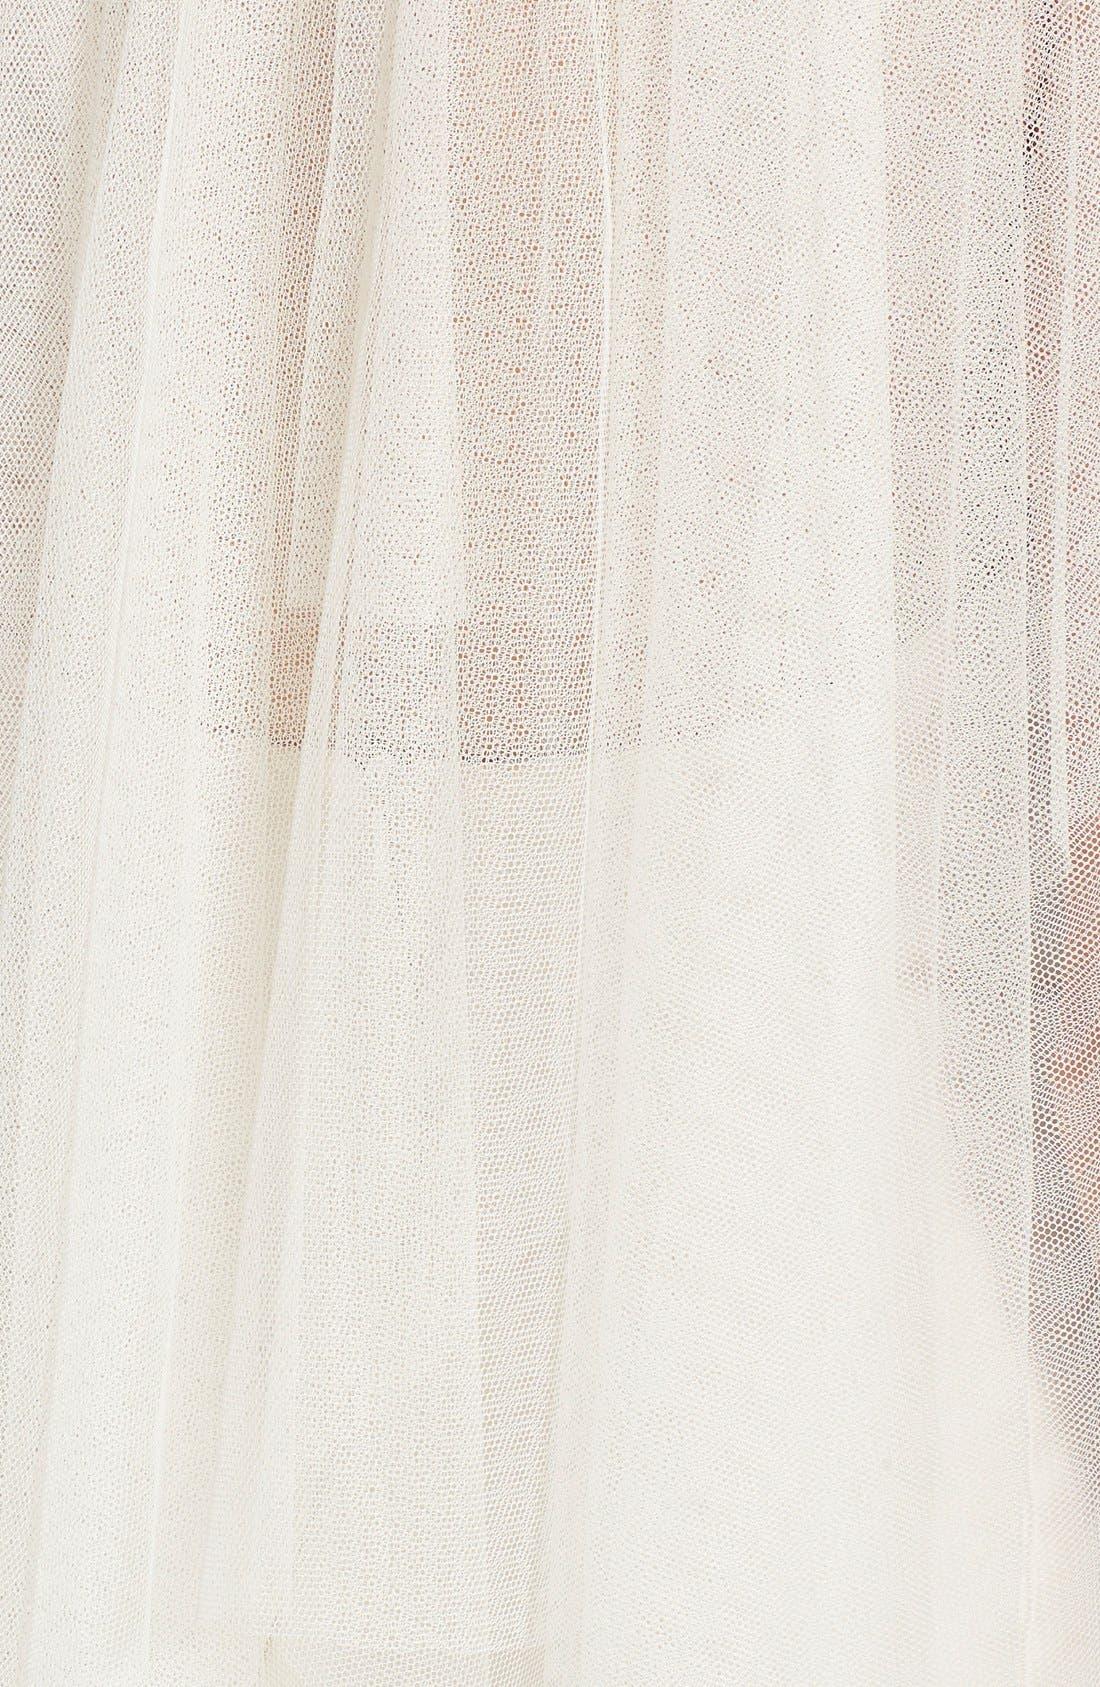 'Padma' Spanish Tulle Waltz Length Veil,                             Alternate thumbnail 2, color,                             900